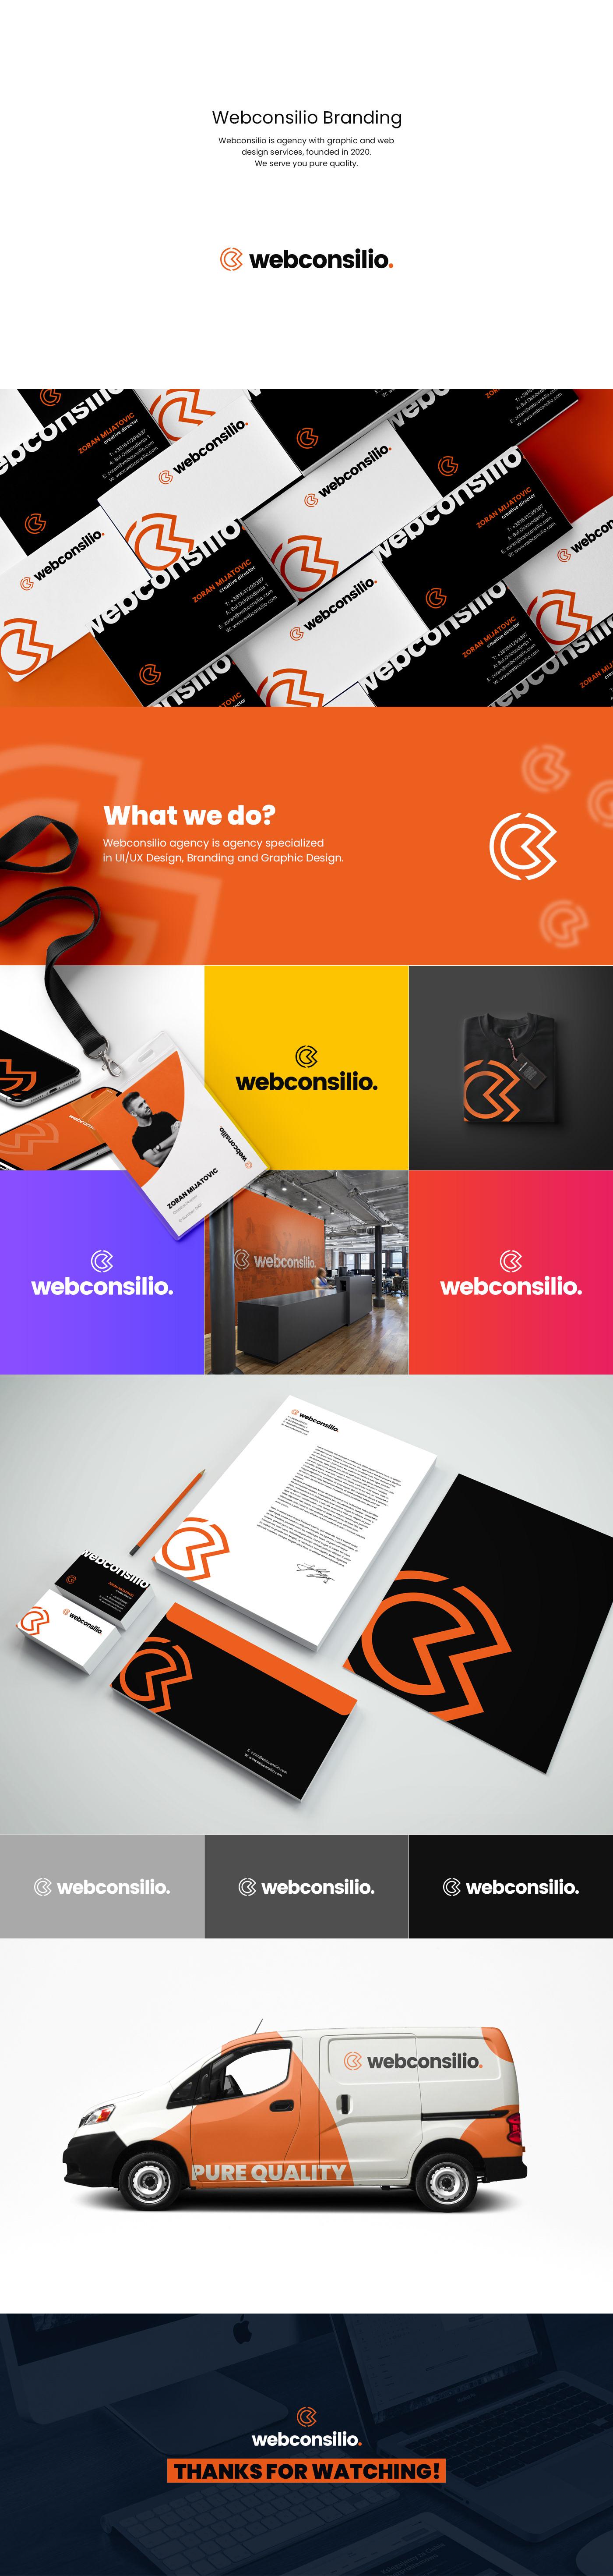 agency brand identity branding  business card design logo mockups uiux Van Web